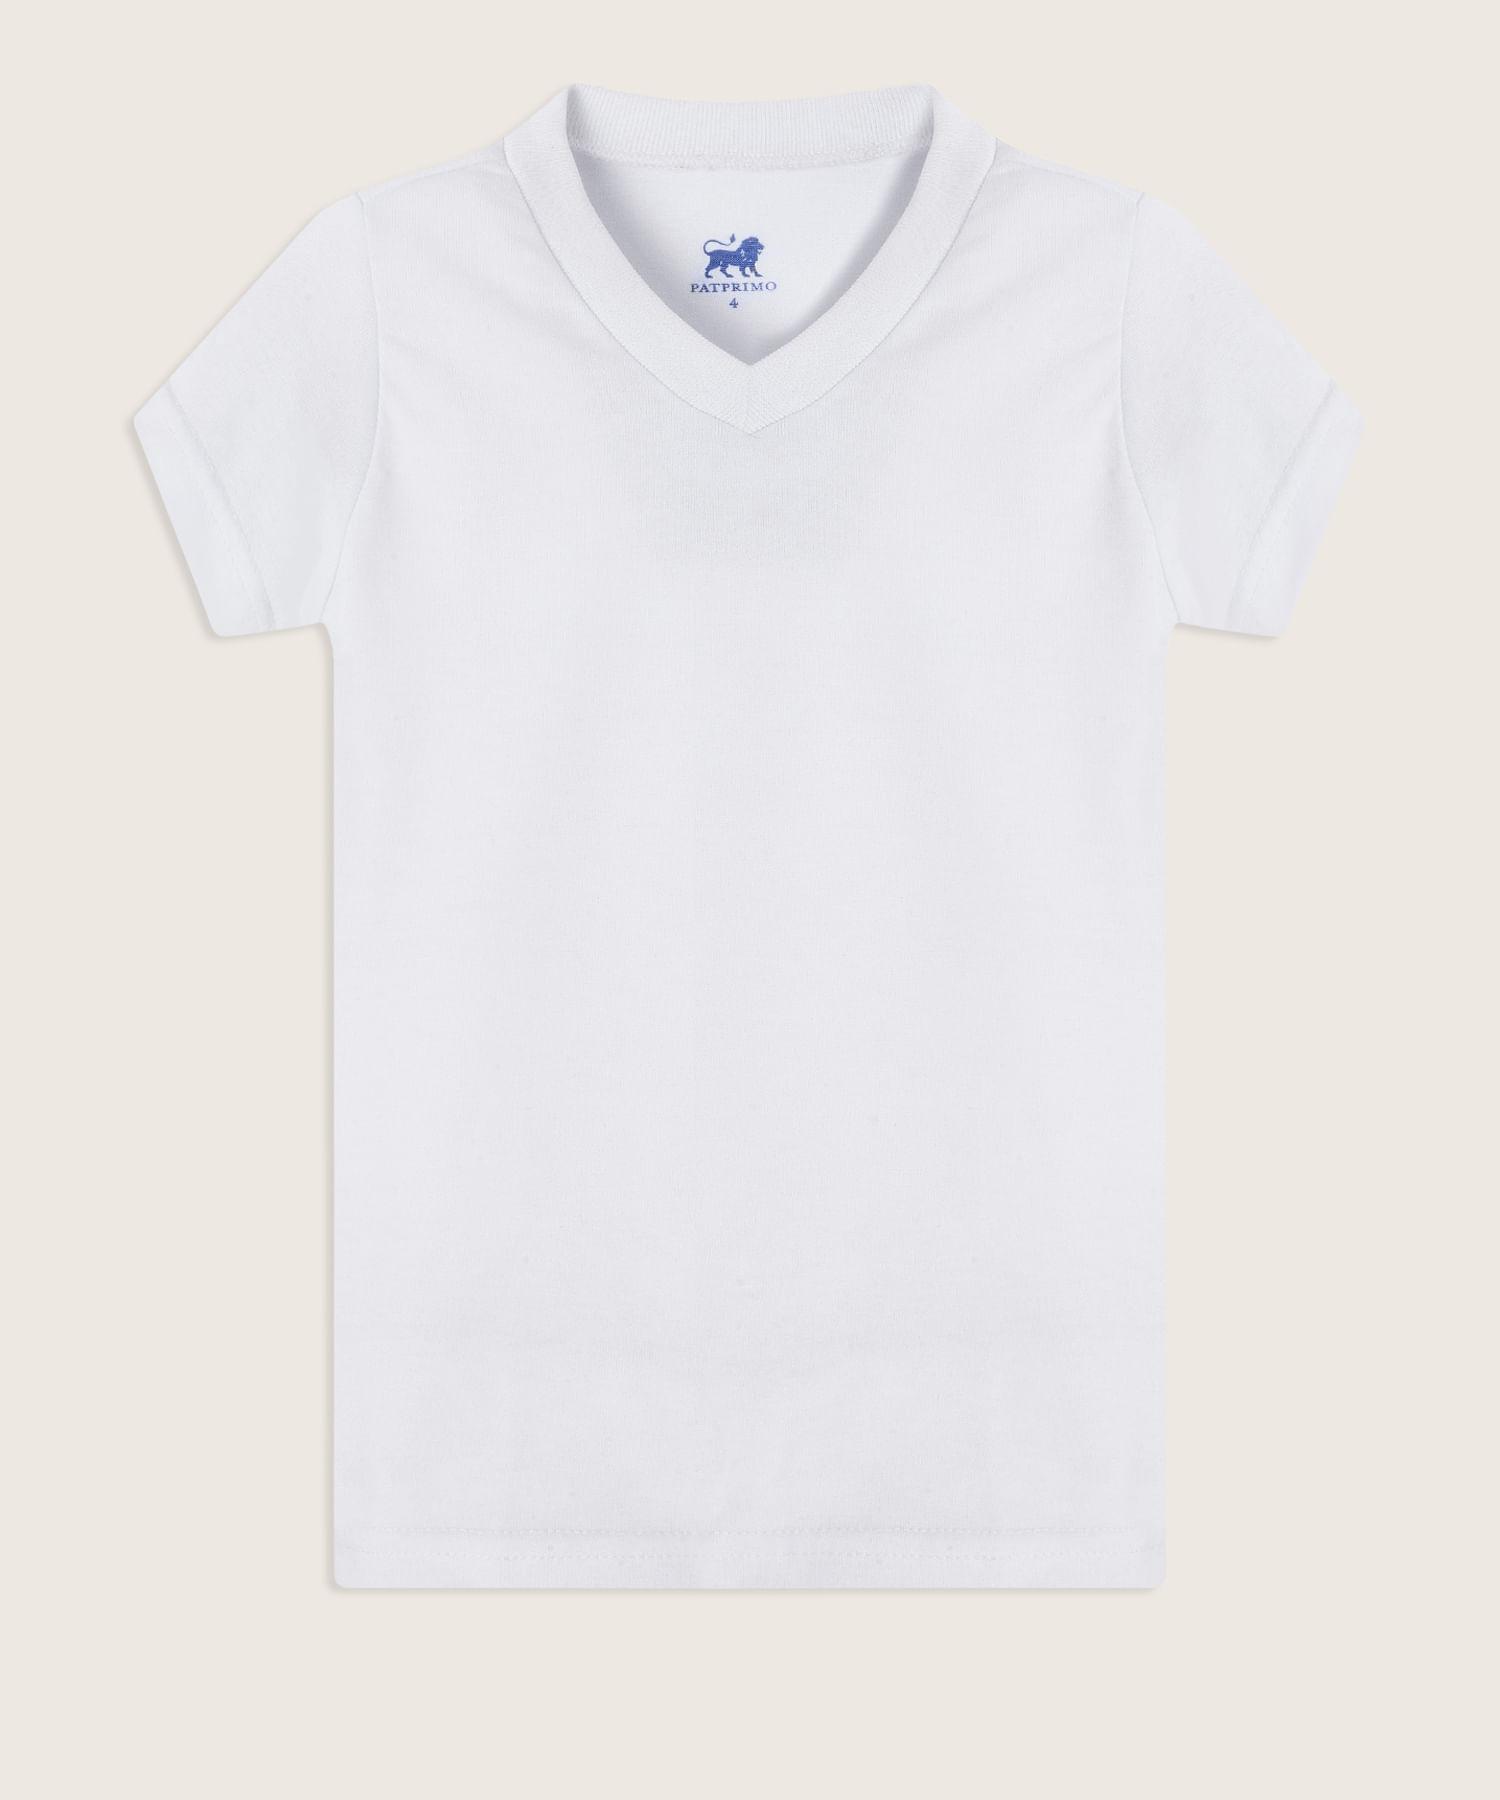 1654ac046 Camiseta Interior Blanca Lisa 64020001 - Patprimo